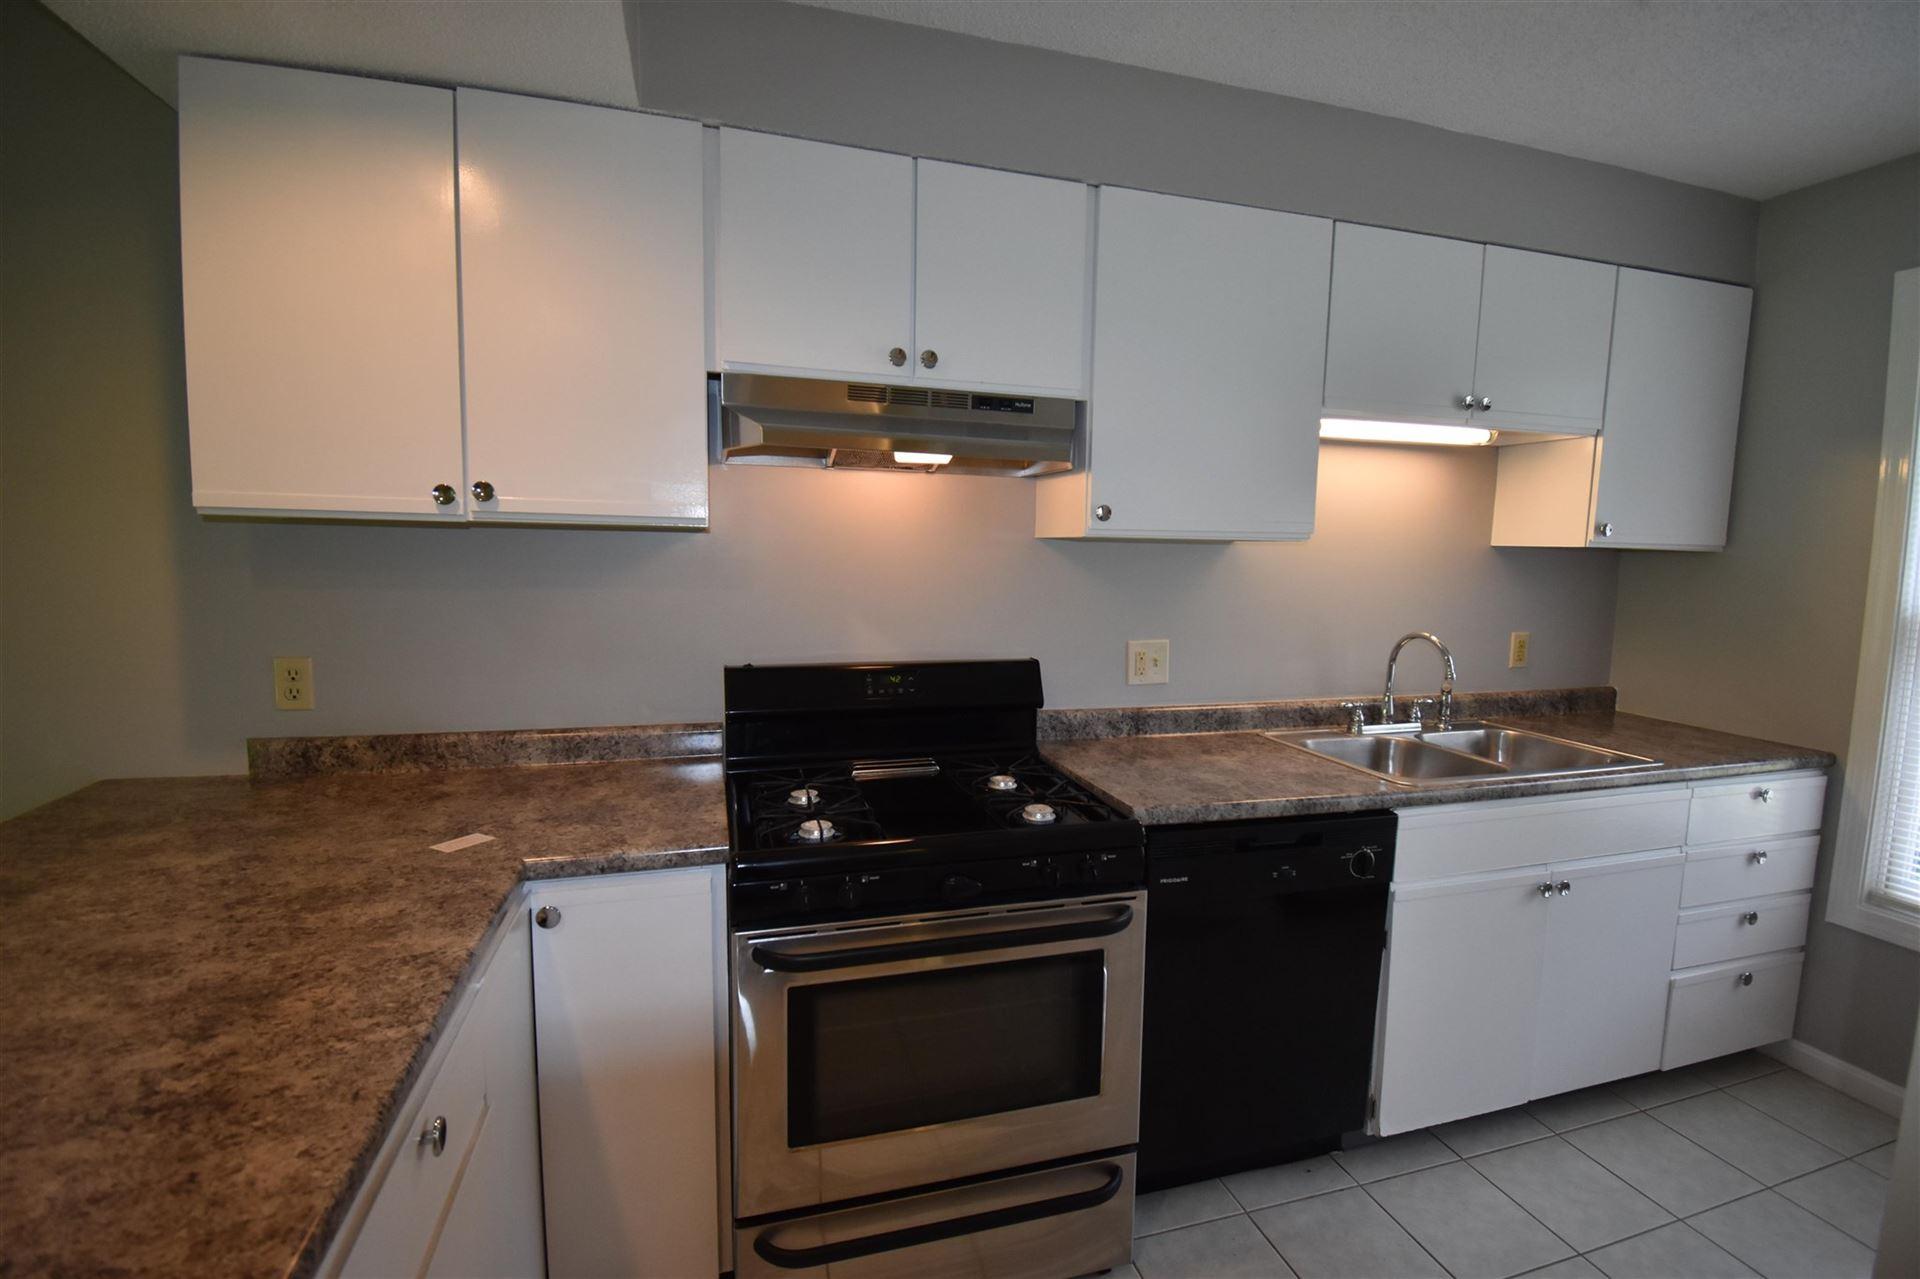 10 Merrill Place #161, Enfield, NH 03748 - MLS#: 4868063